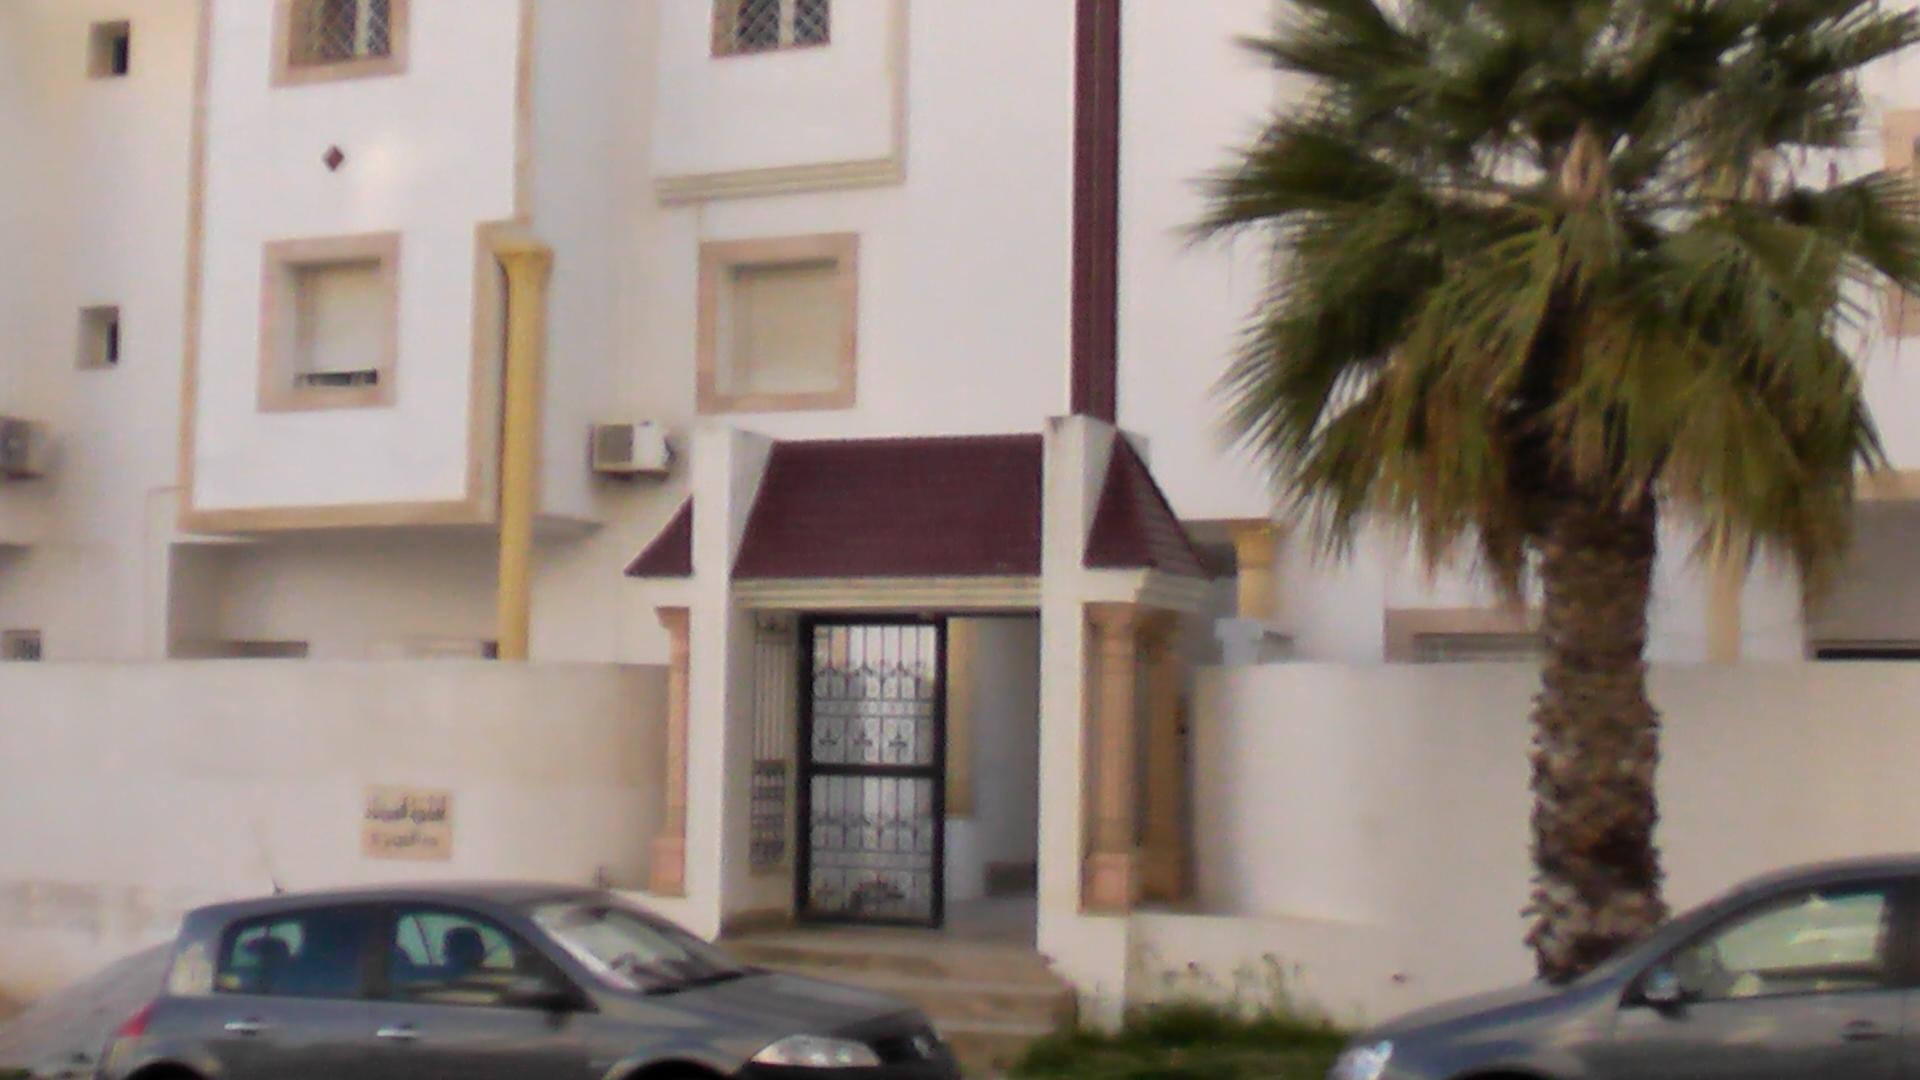 Ariana tunisie vente achat location appartement terrain for Achat location appartement